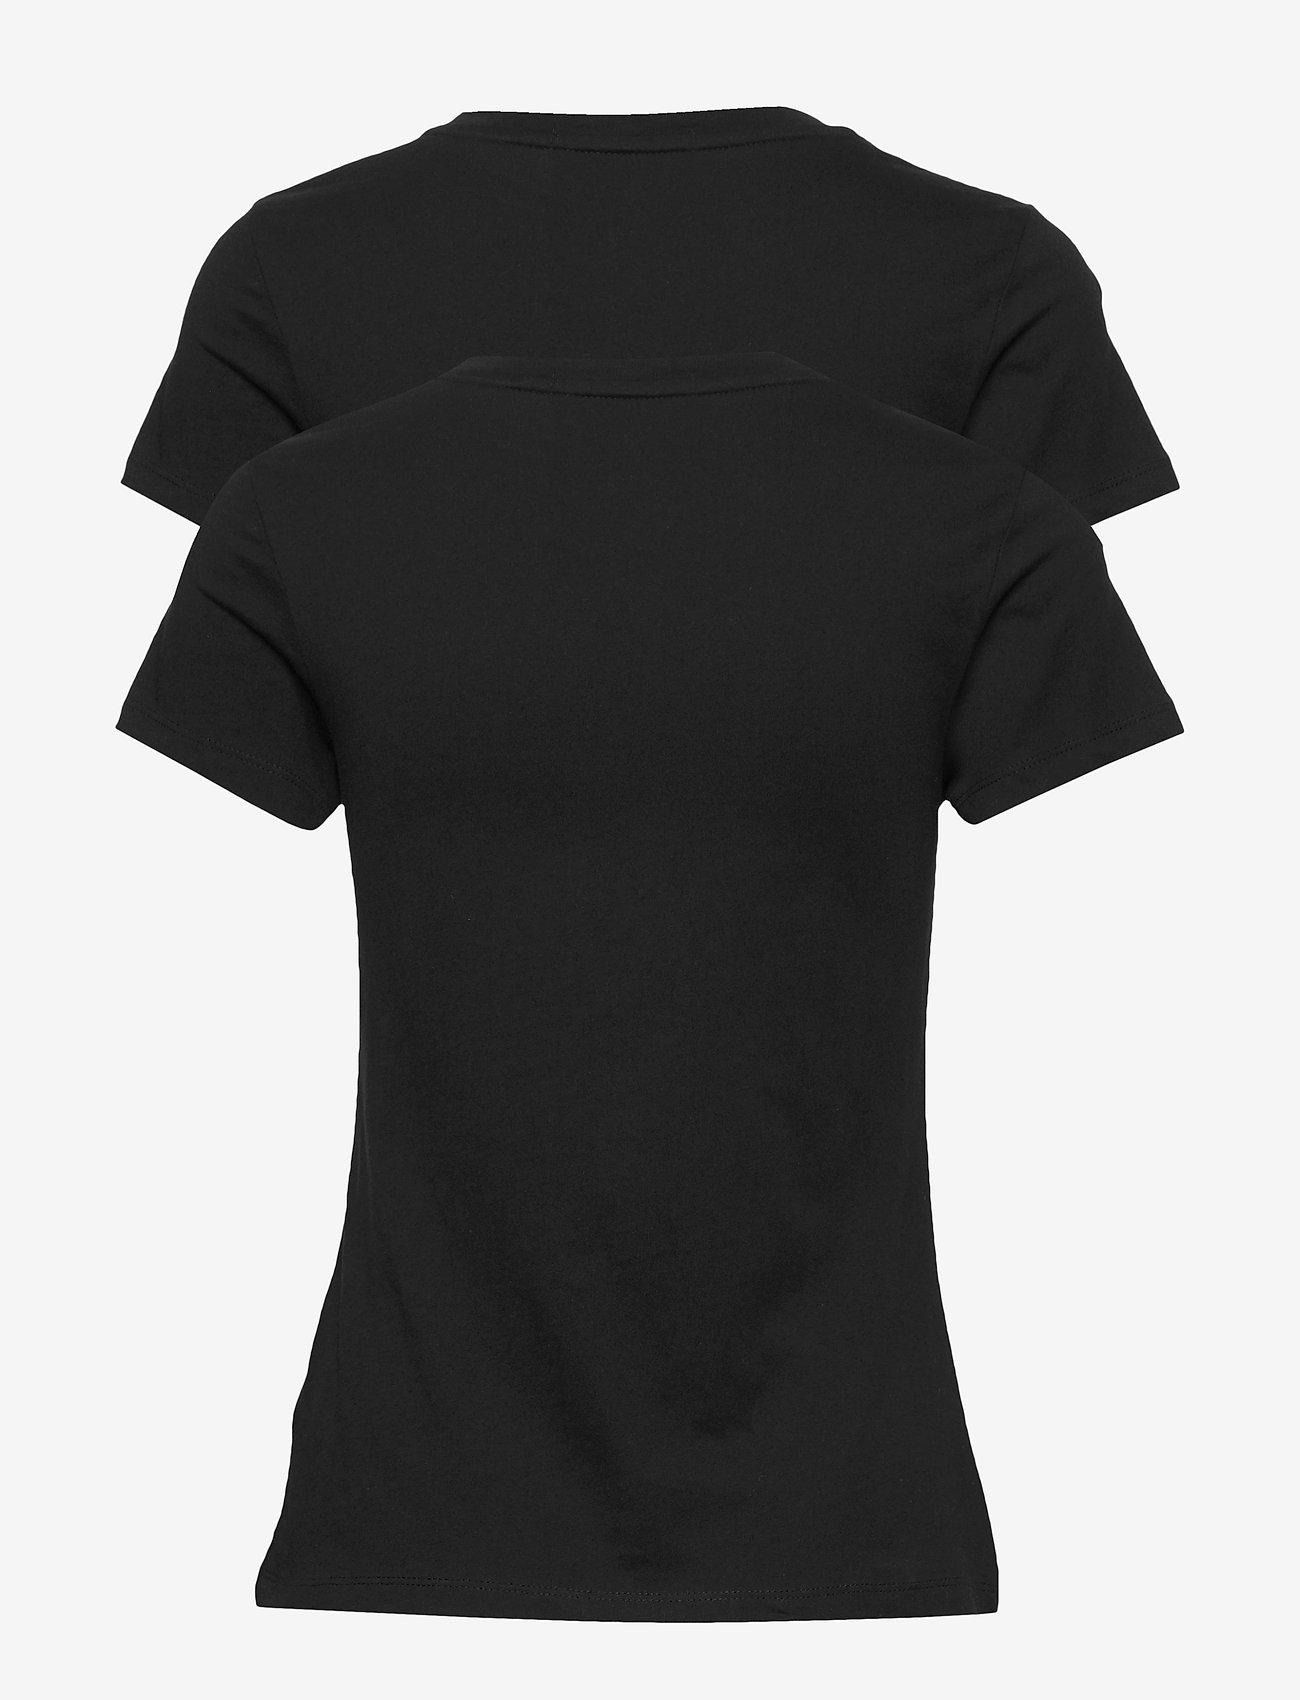 Calvin Klein Jeans - 2 PACK SLIM T-SHIRT - t-shirts - ck black / ck black - 1